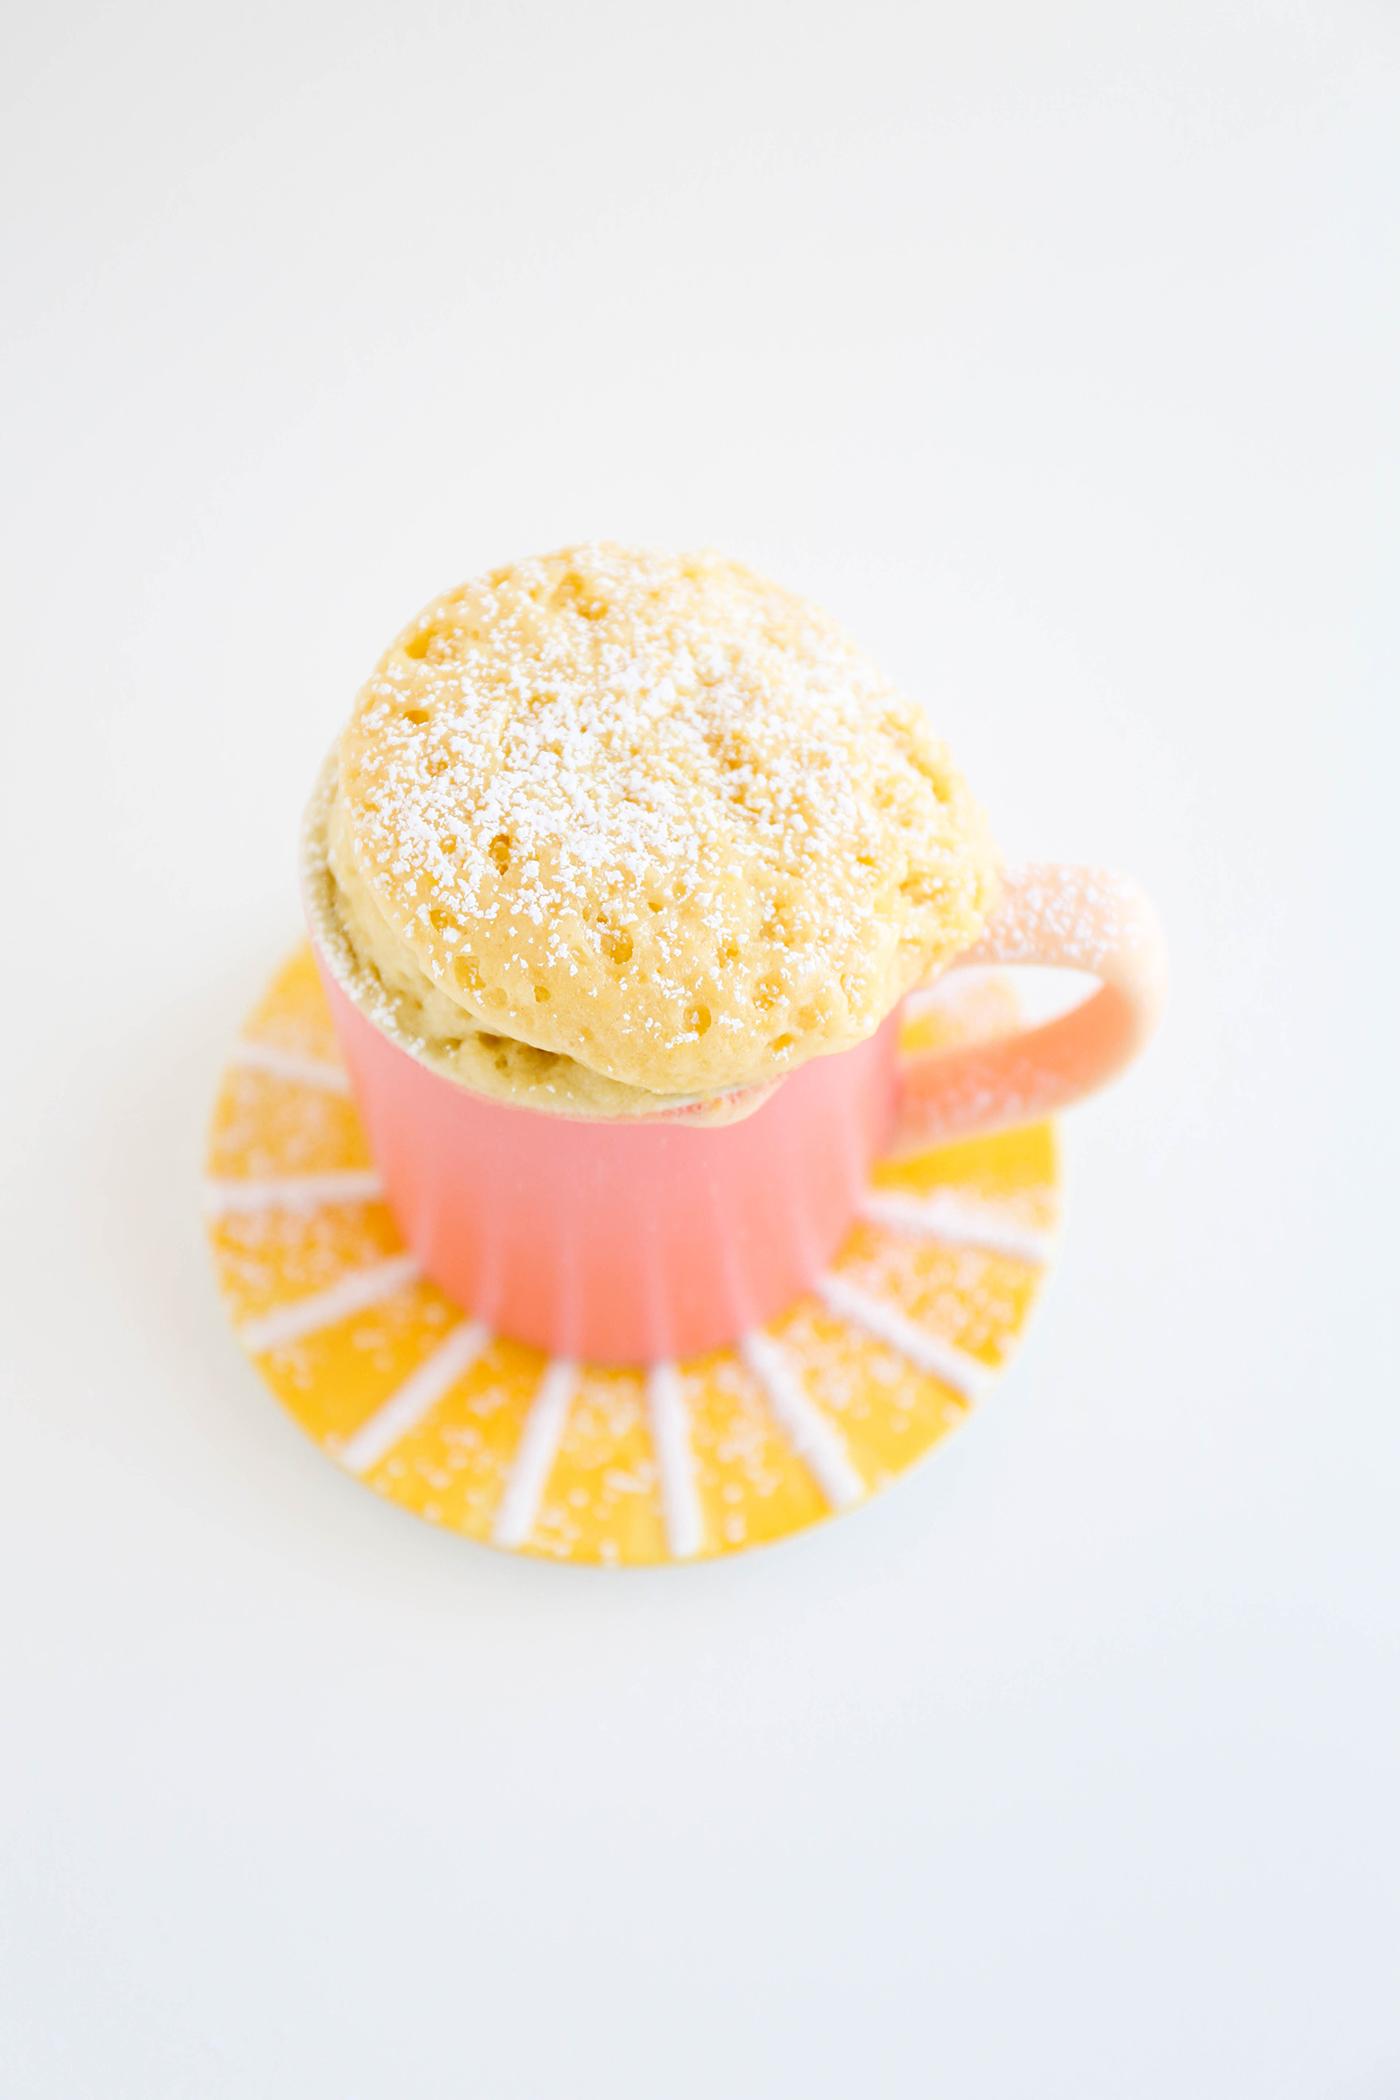 Would Lemon Cake Taste Good With Vanilla Frosting